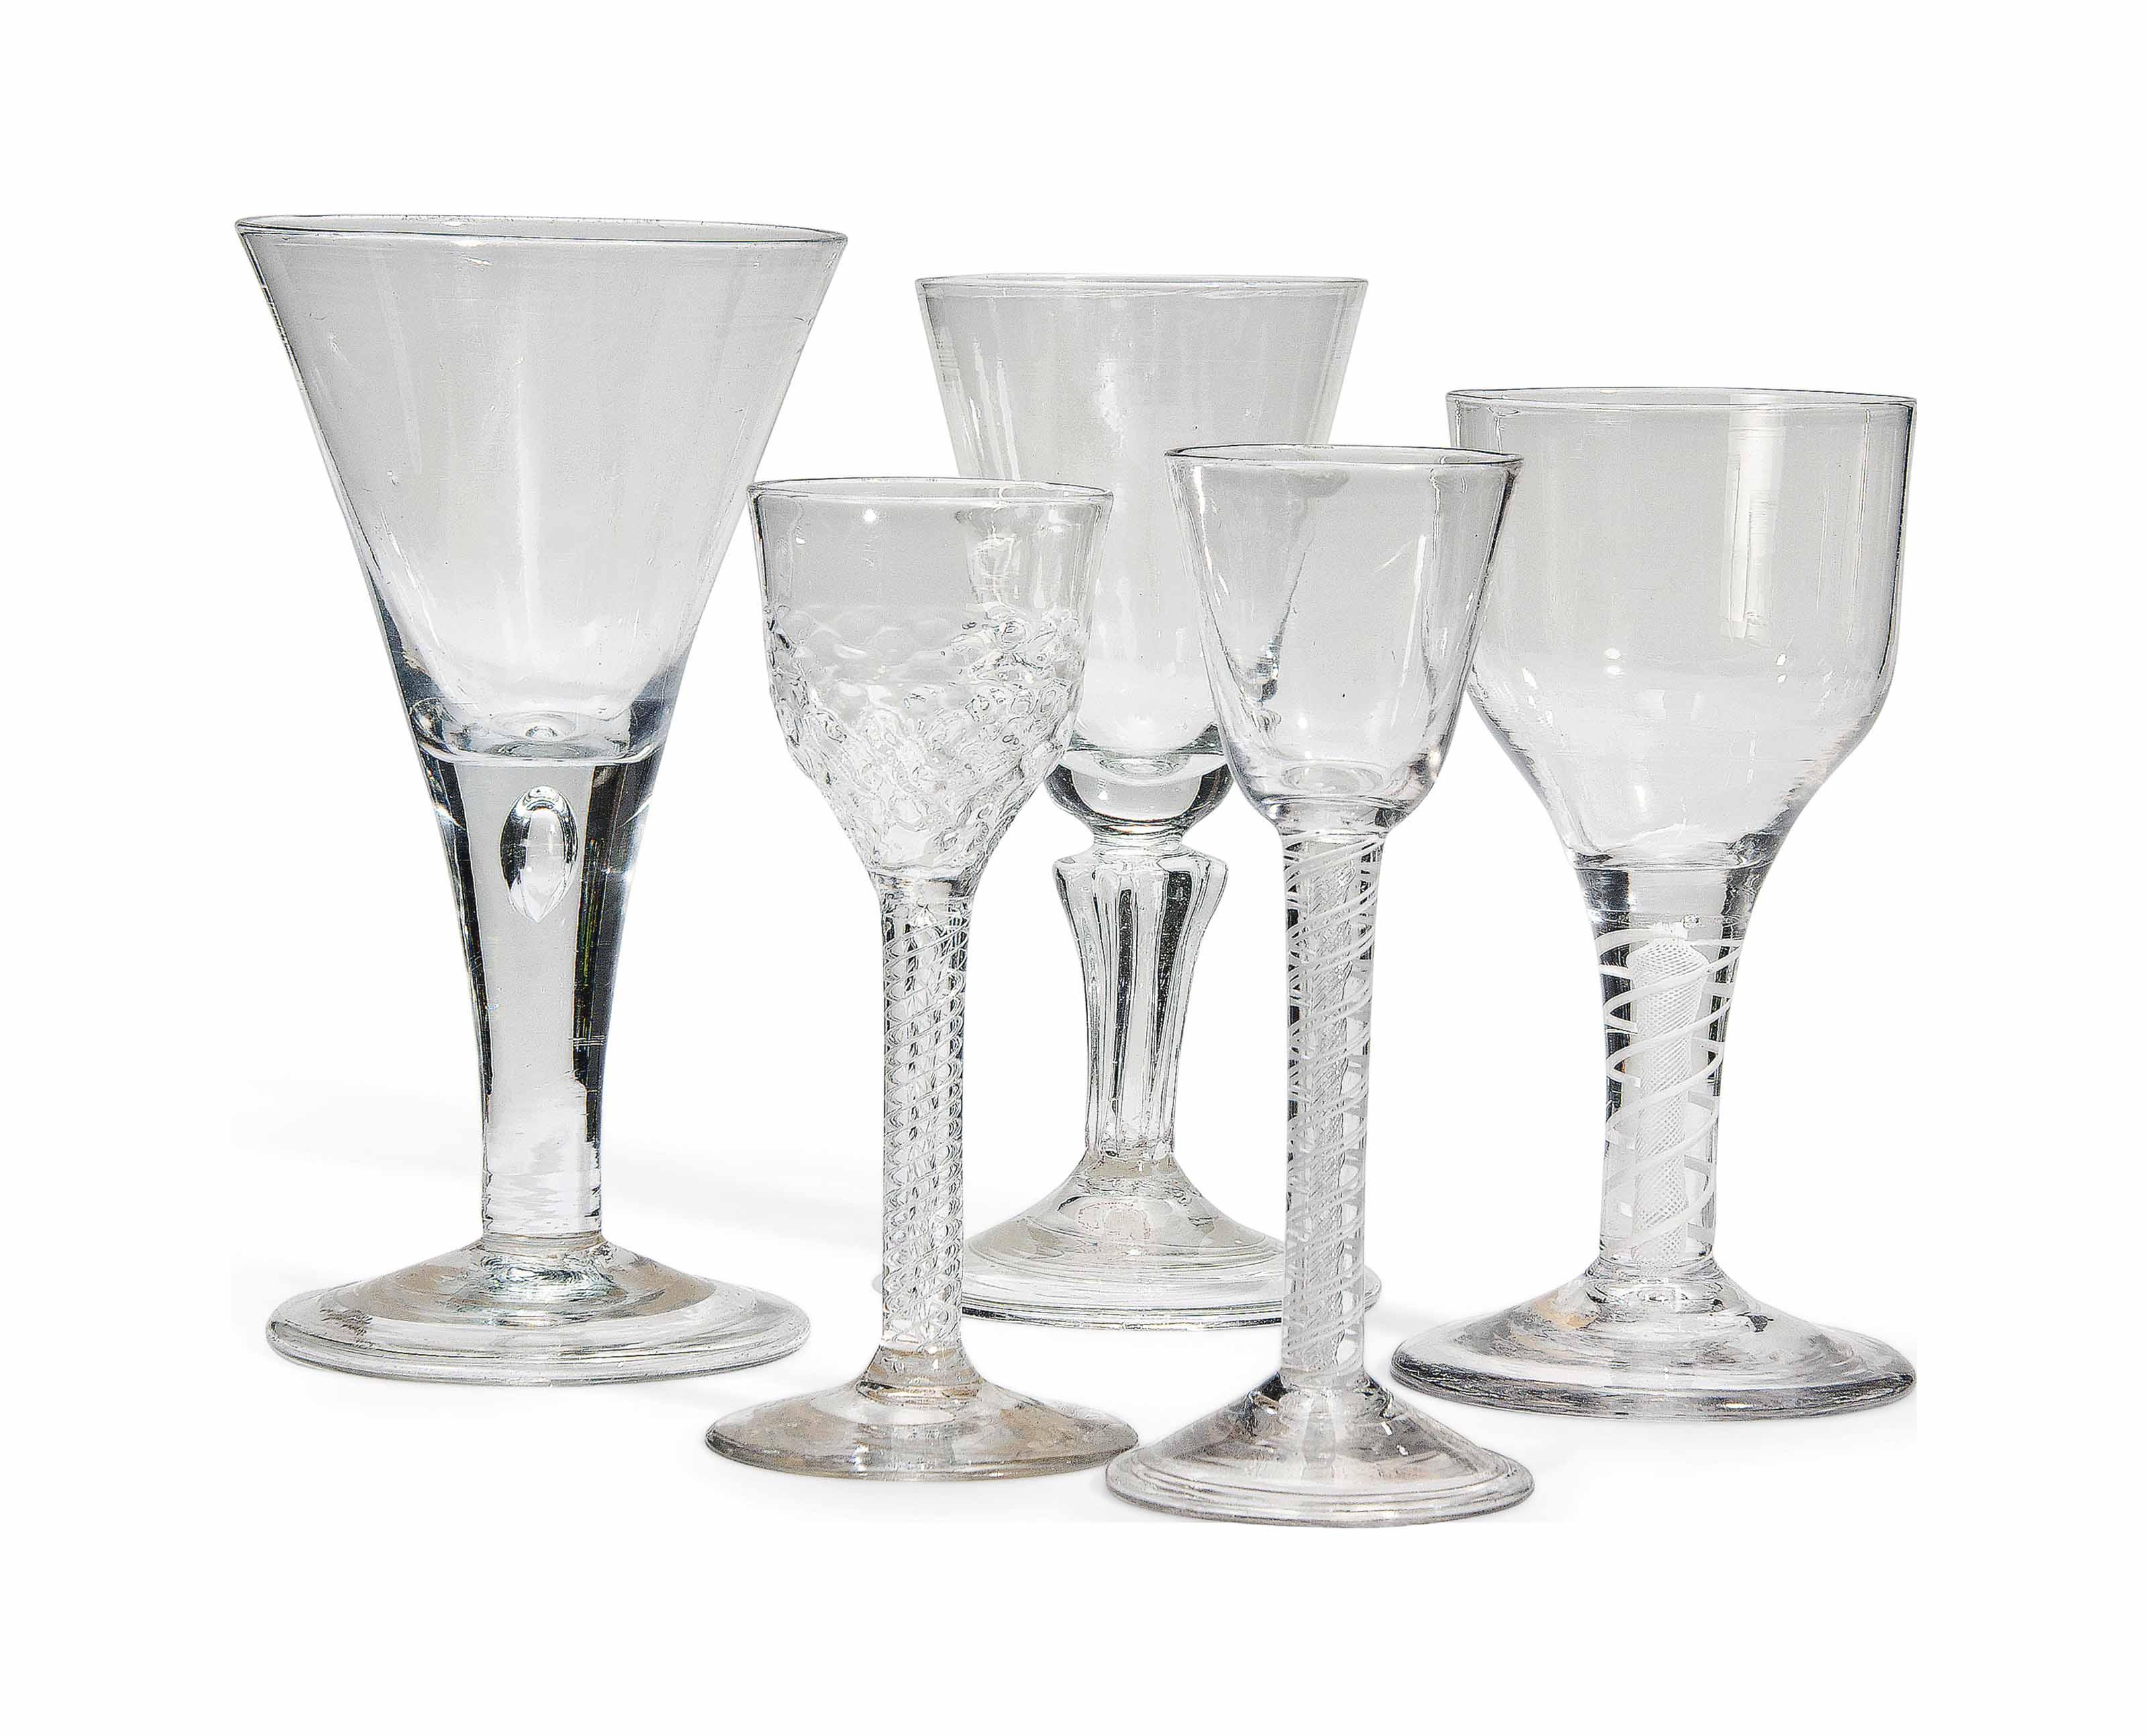 FOUR ENGLISH DRINKING GLASSES